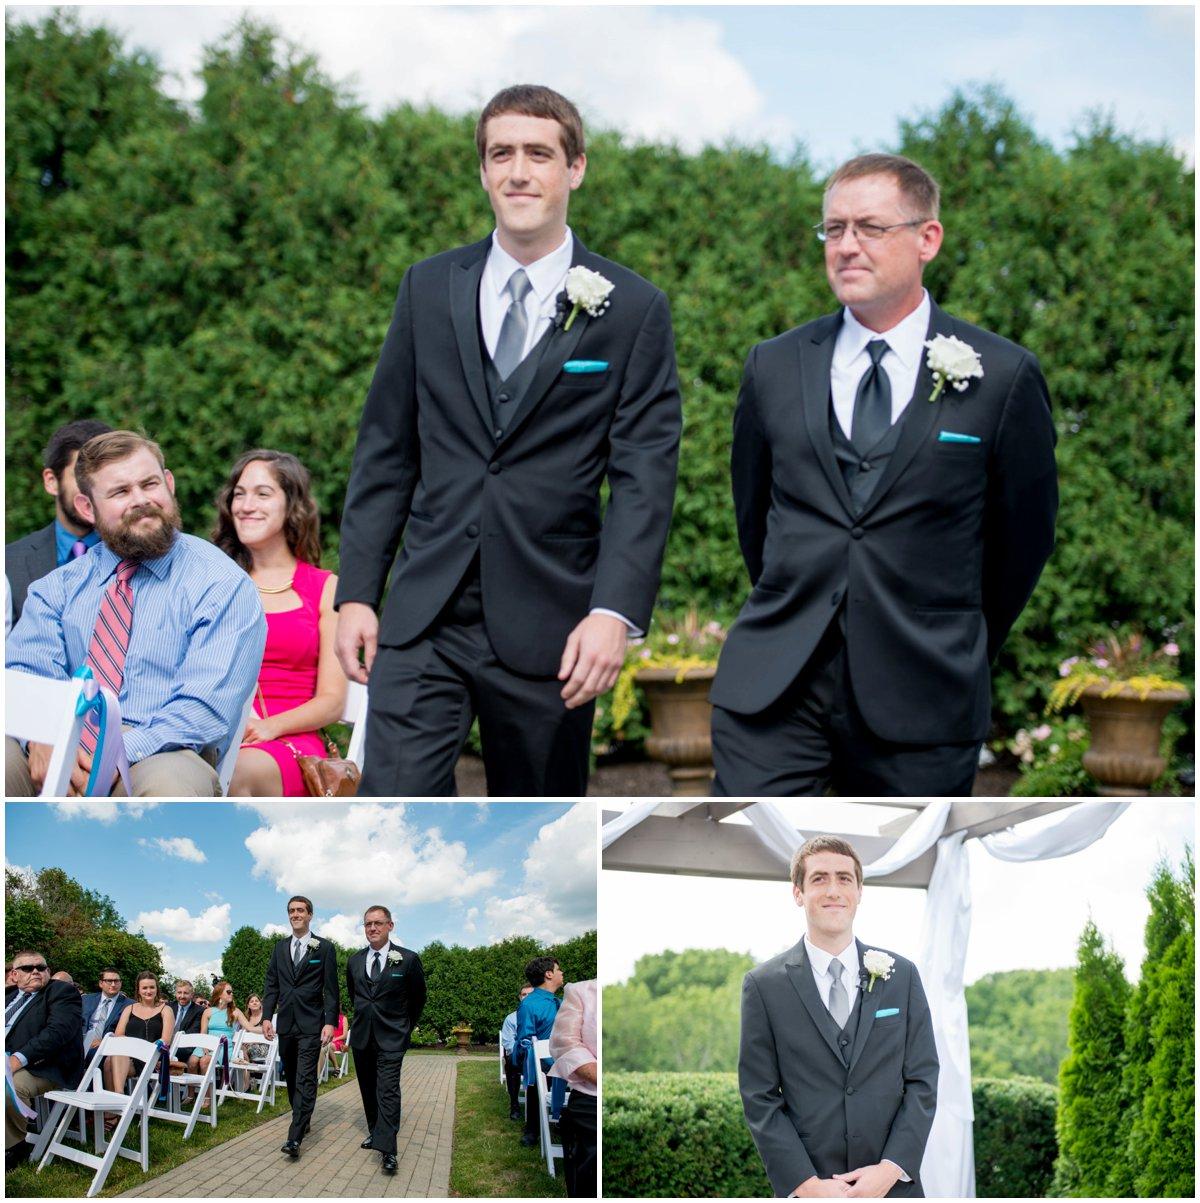 Mavris-wedding-pictures-Nate-Crouch-012.jpg